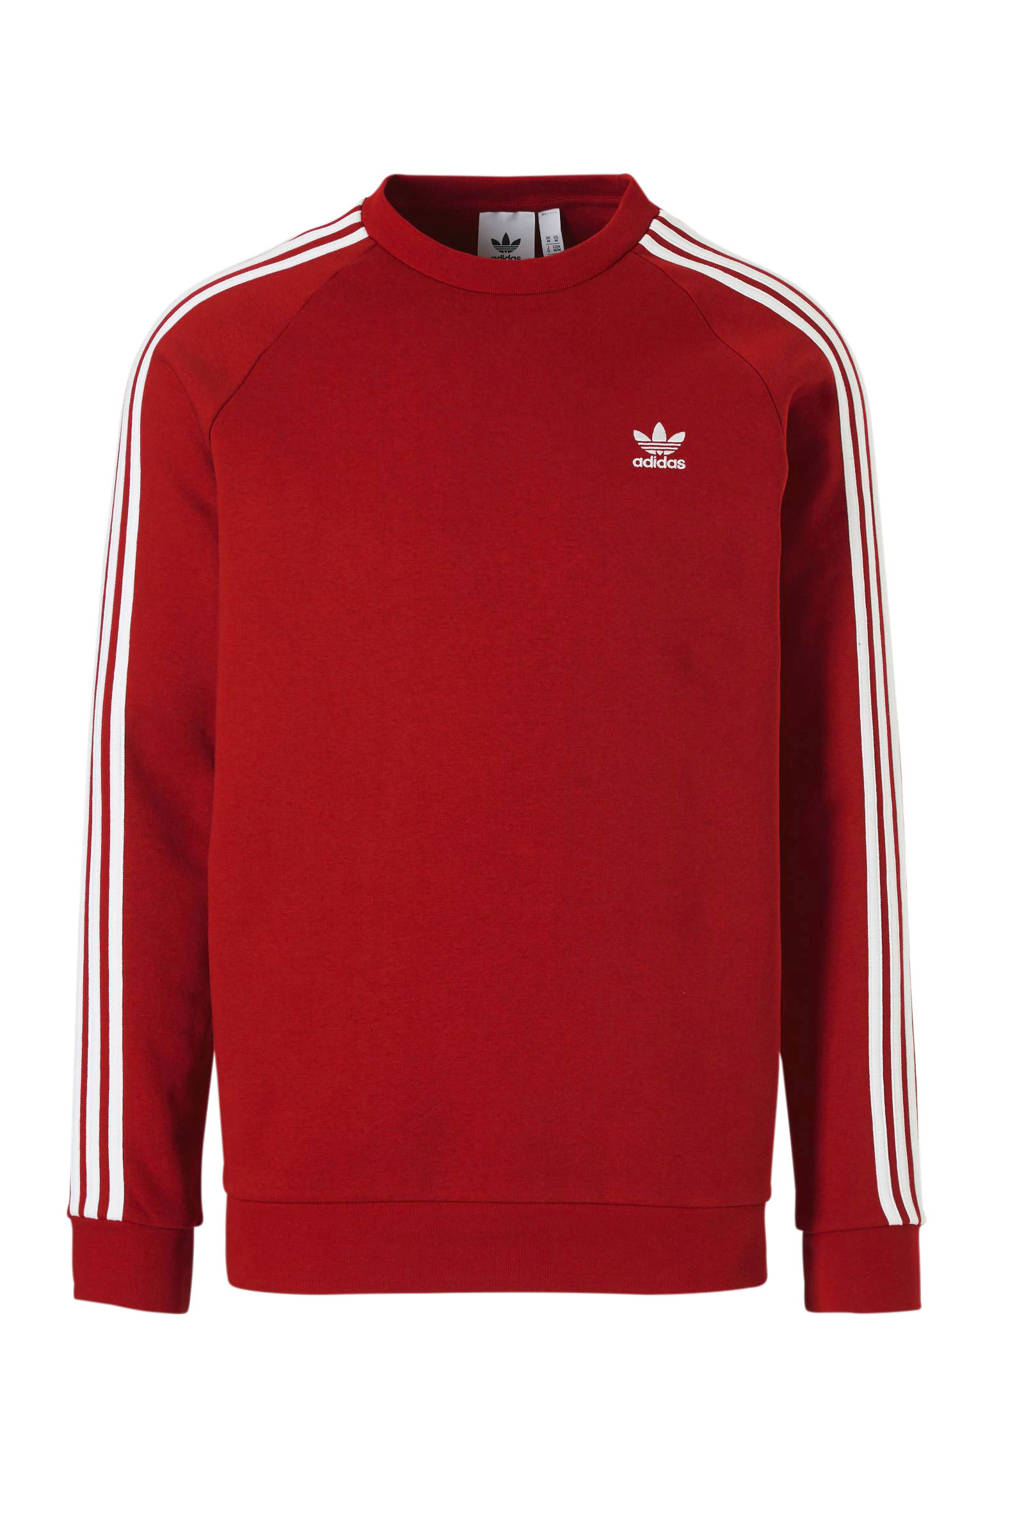 adidas originals   sweater rood, Rood/wit